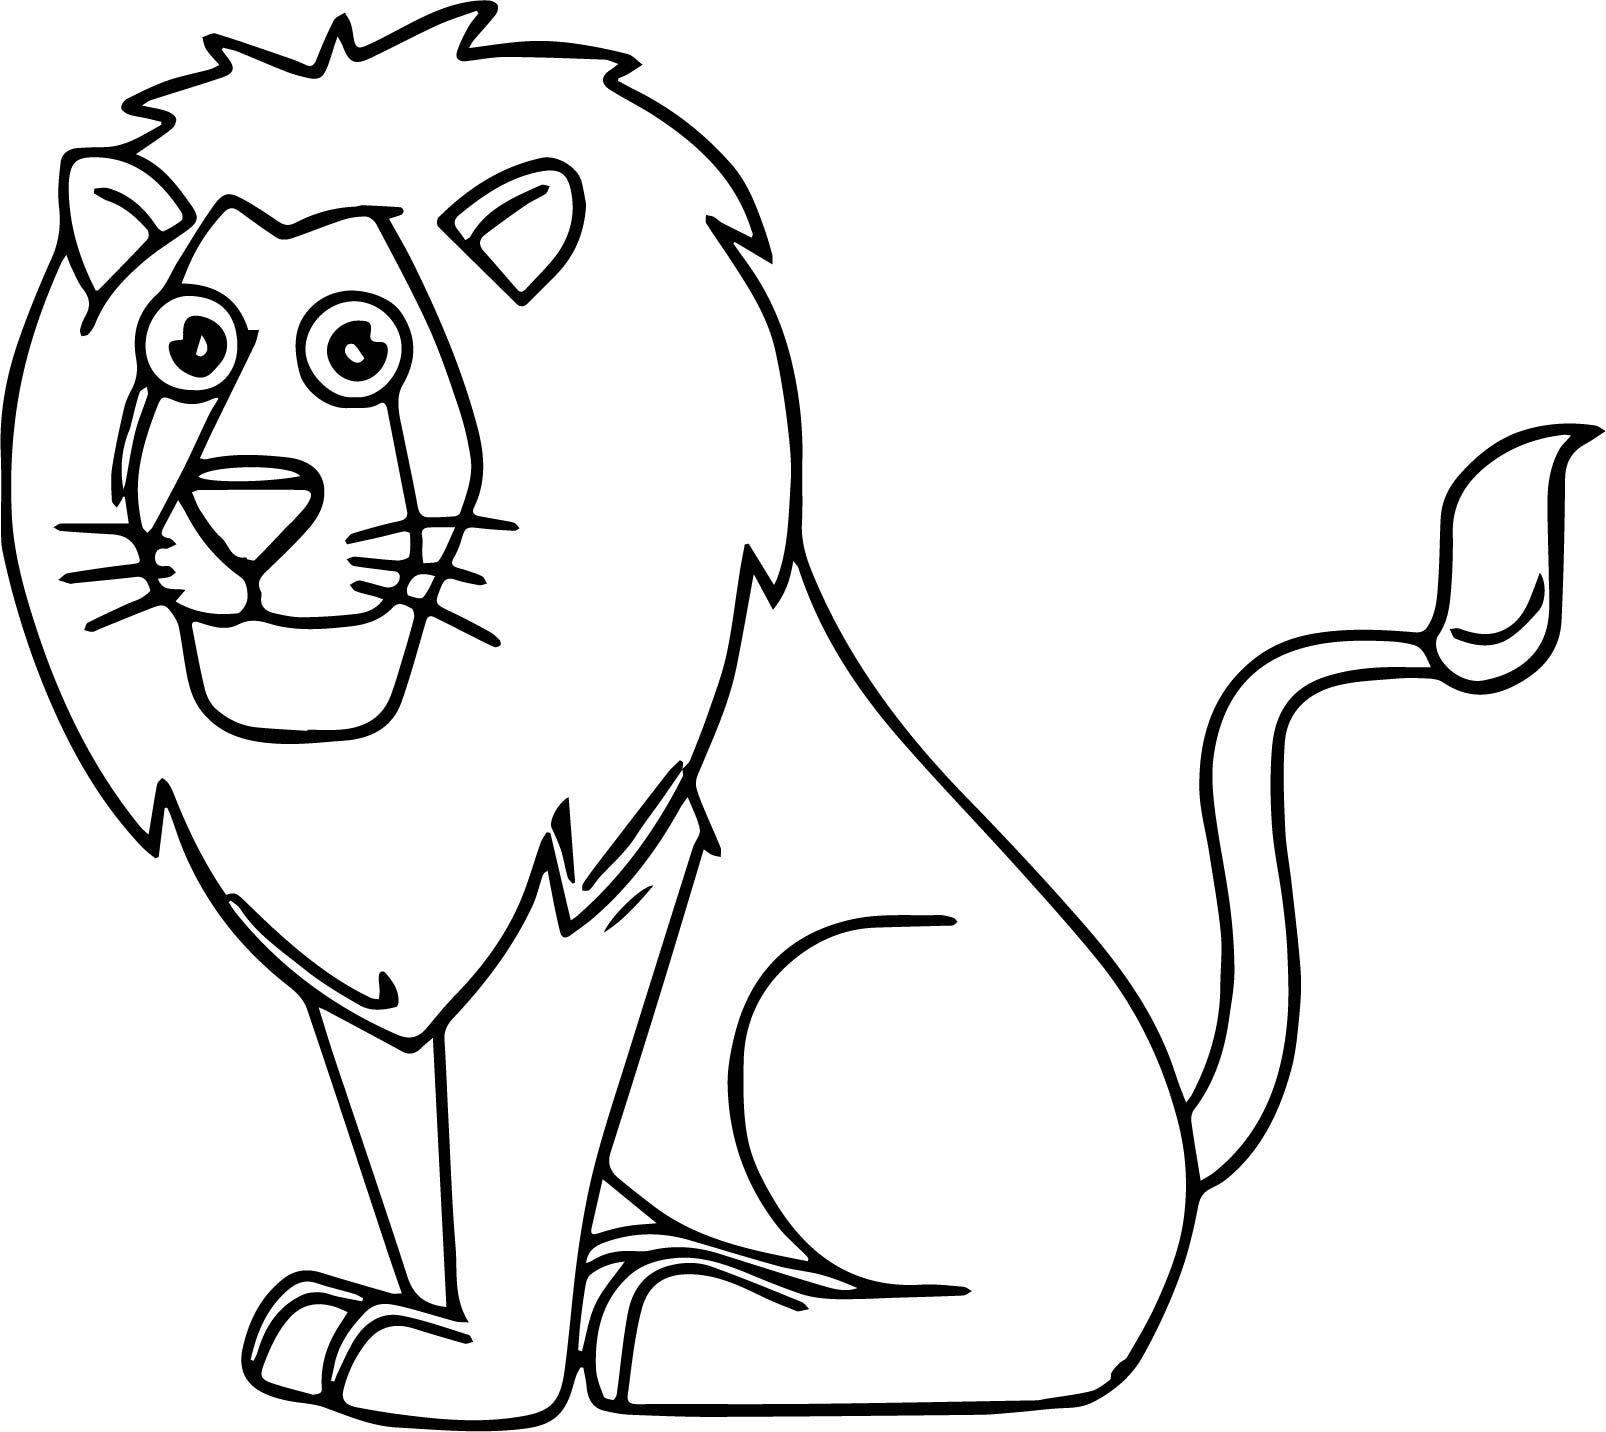 Lion Sitting Cartoon Animal Kingdom Coloring Page Lion Coloring Pages Animal Coloring Pages Lion Coloring